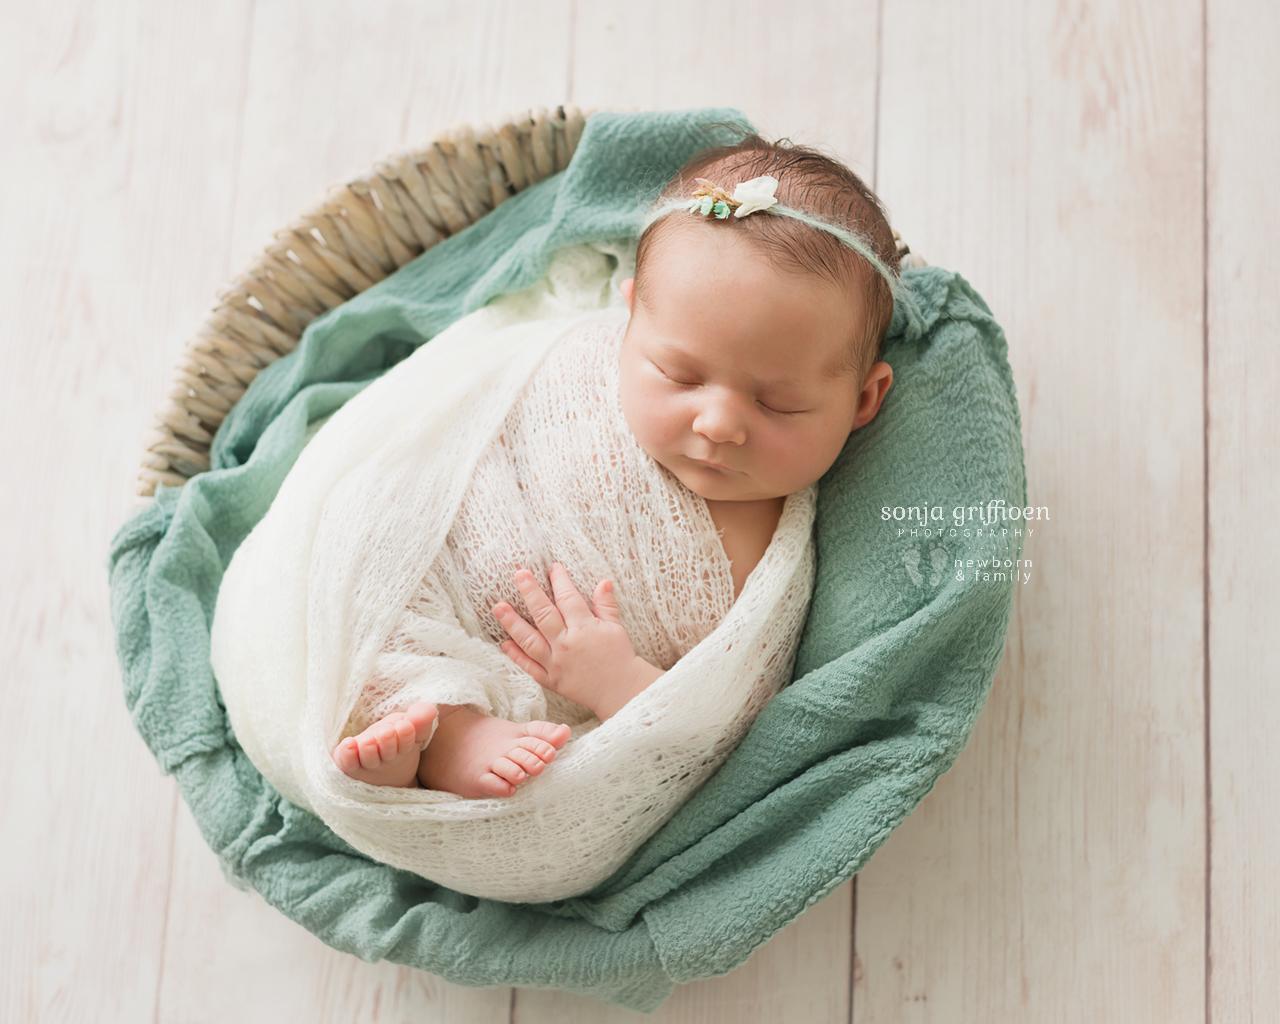 Elsi-Newborn-Brisbane-Newborn-Photographer-Sonja-Griffioen-03.jpg